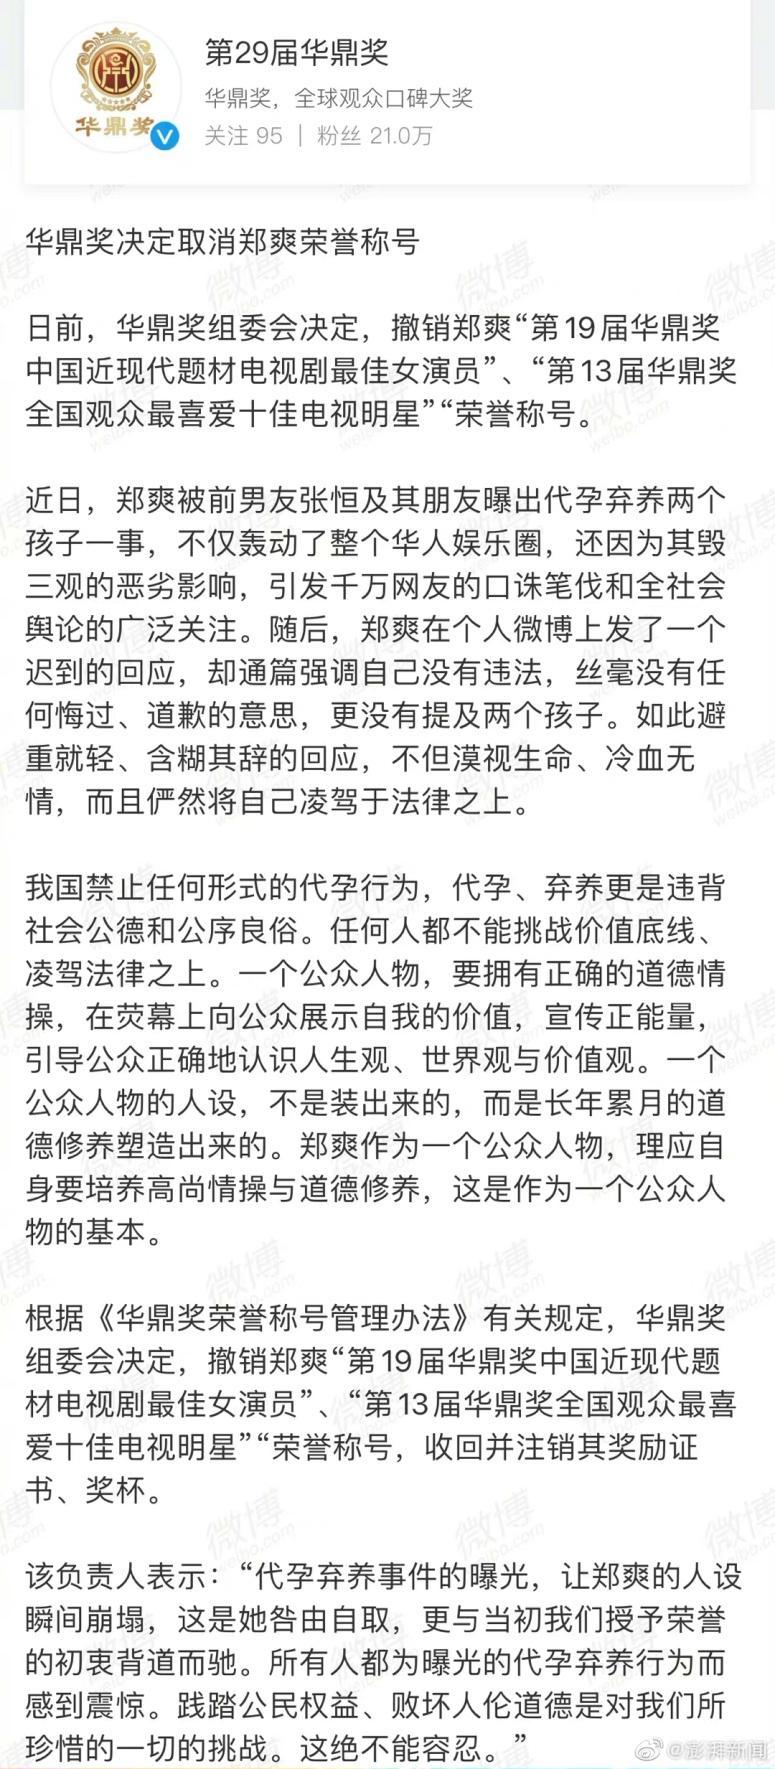 C:\Users\Haruka\Desktop\人民文旅\郑爽\华鼎奖.jpg